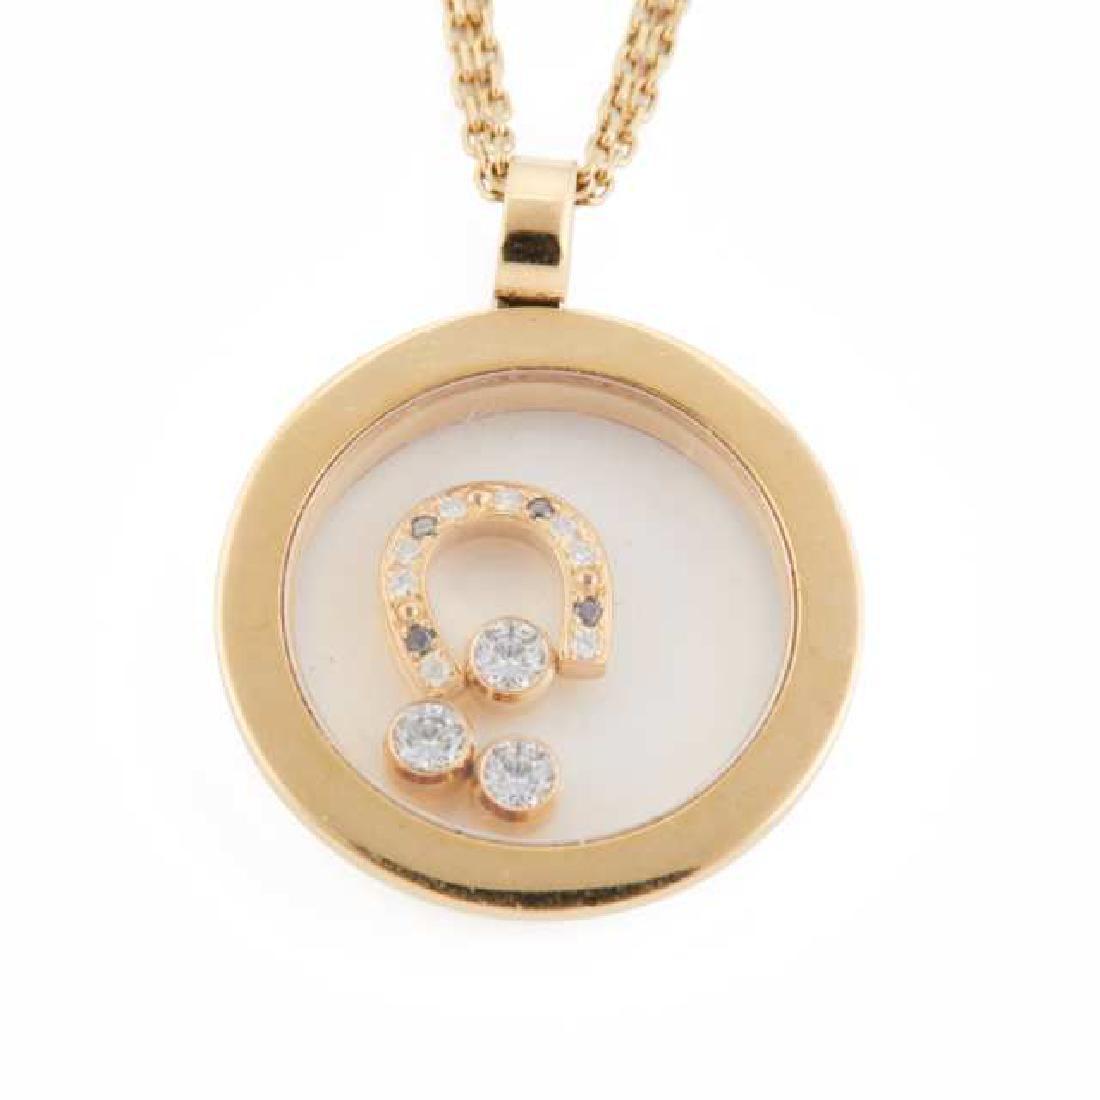 Chopard 18k Yellow Gold Circular Happy Diamond Pendant